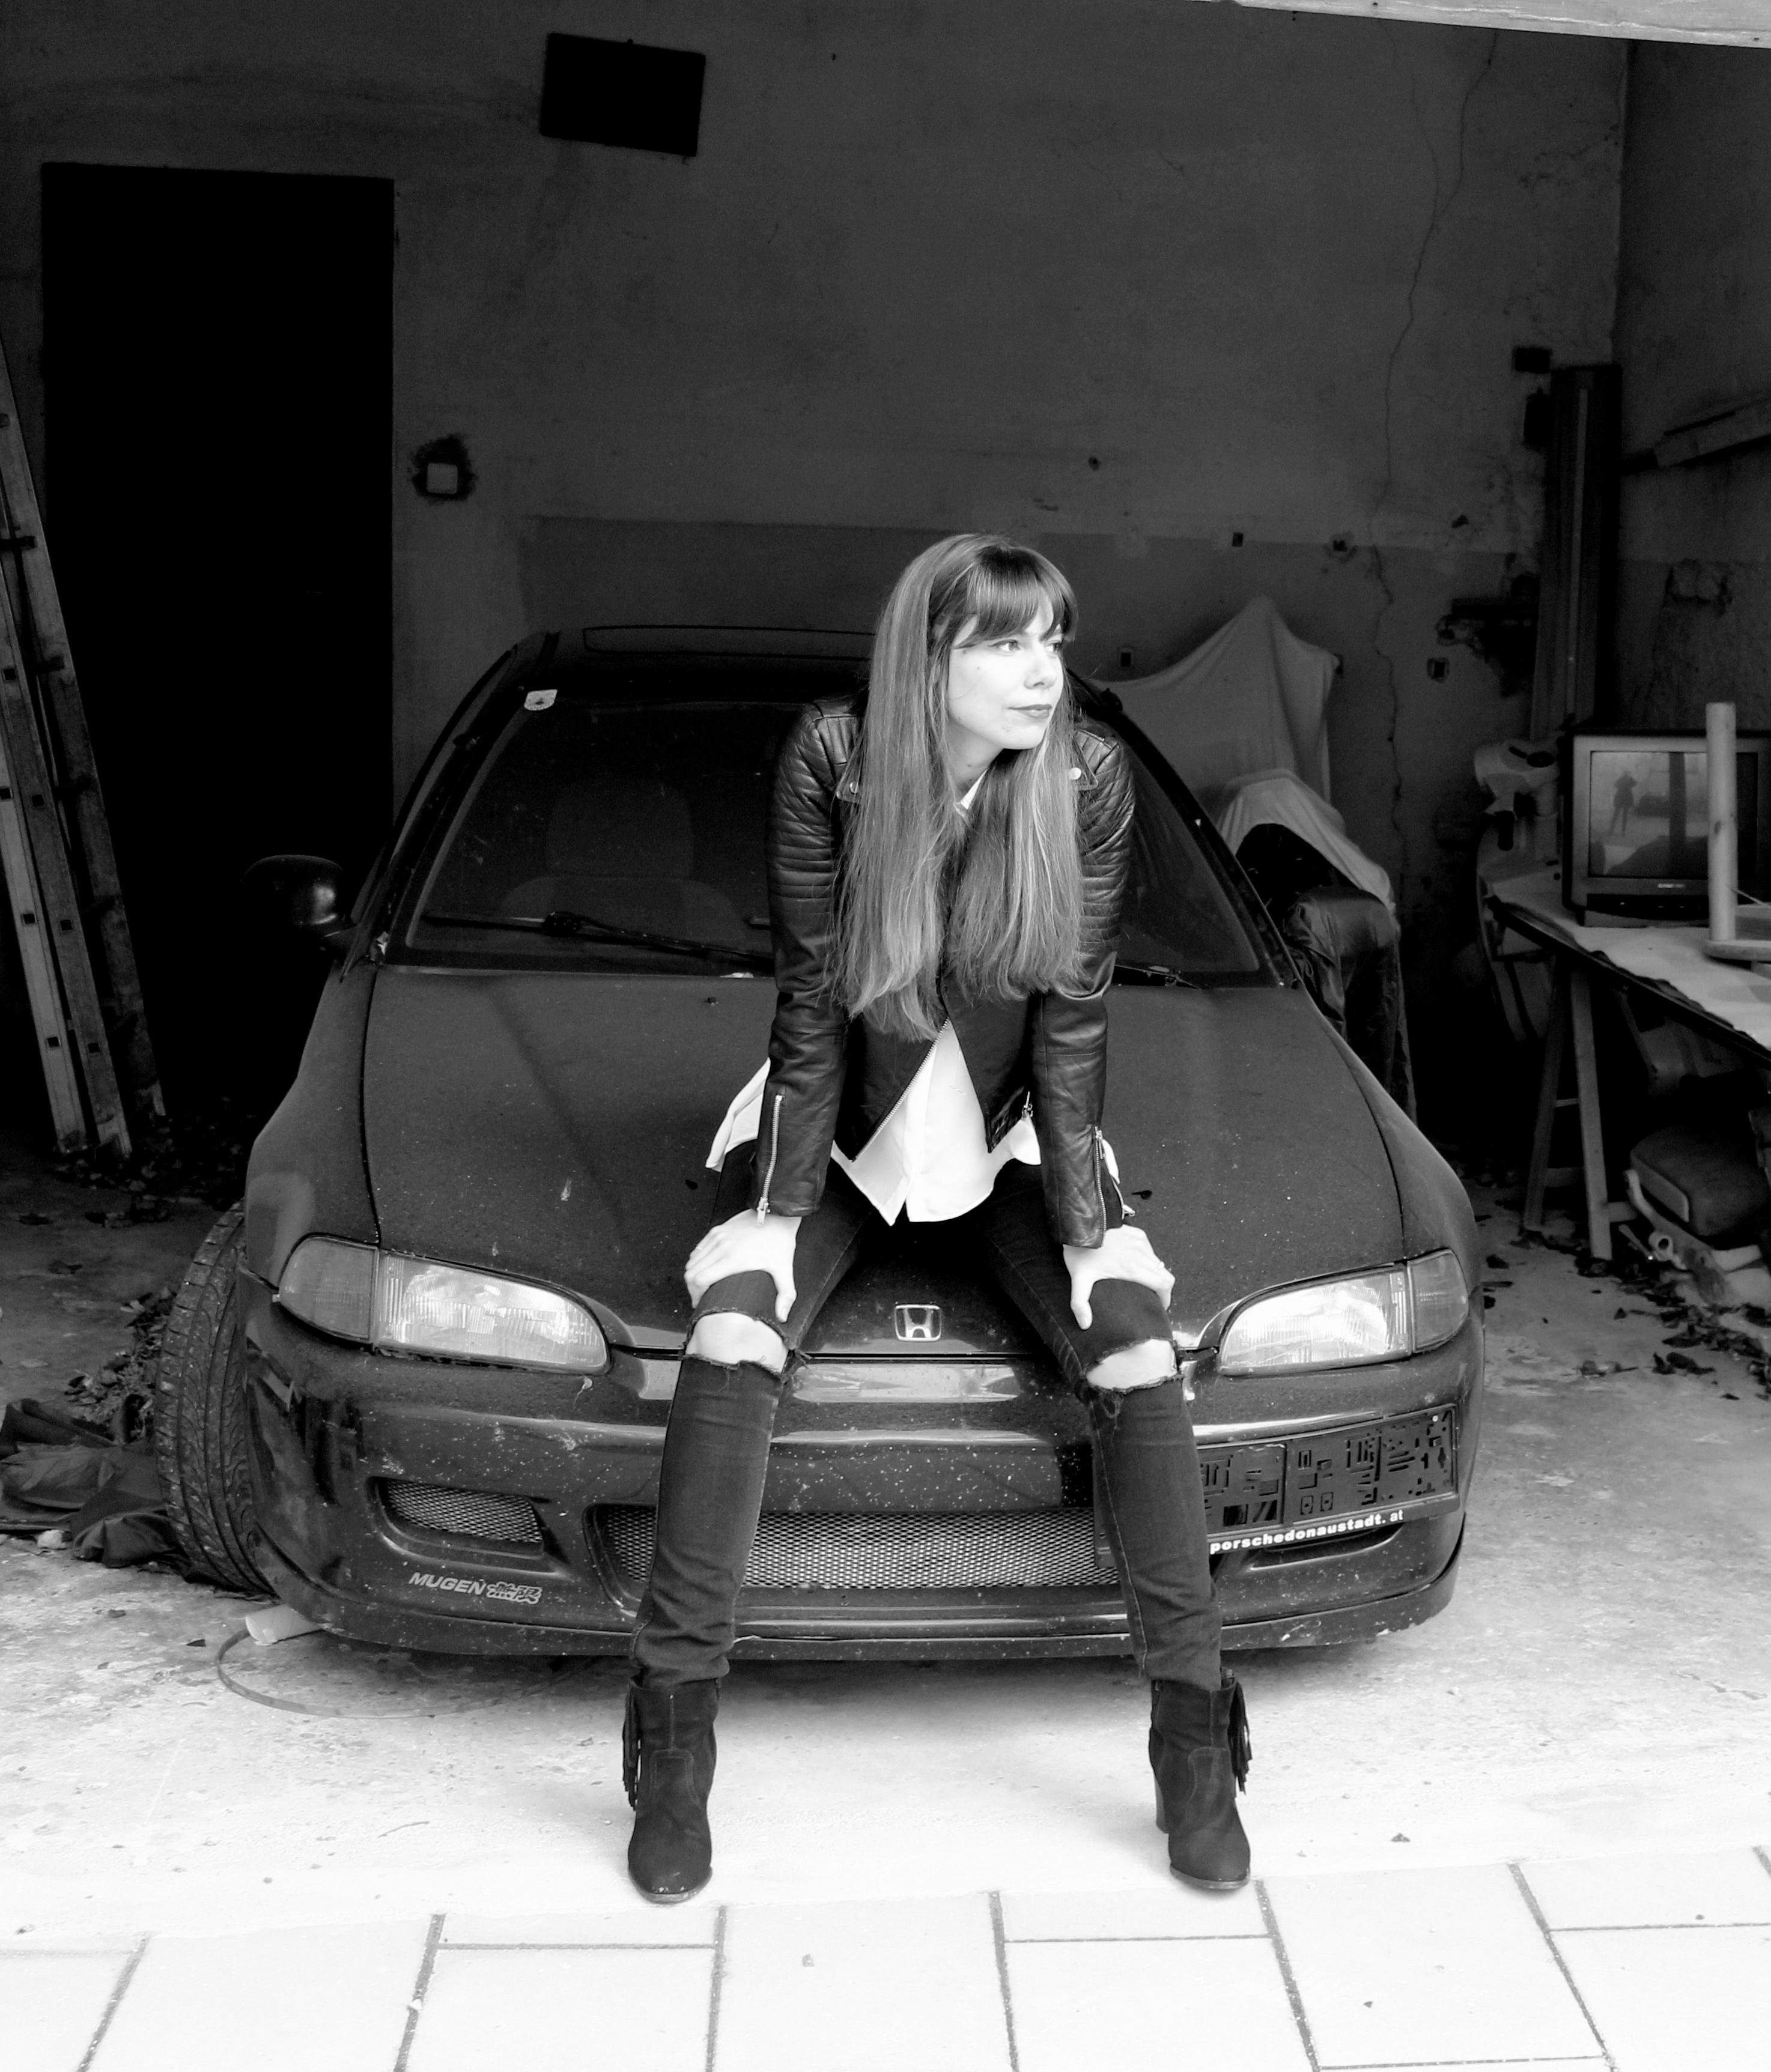 alb-negru2